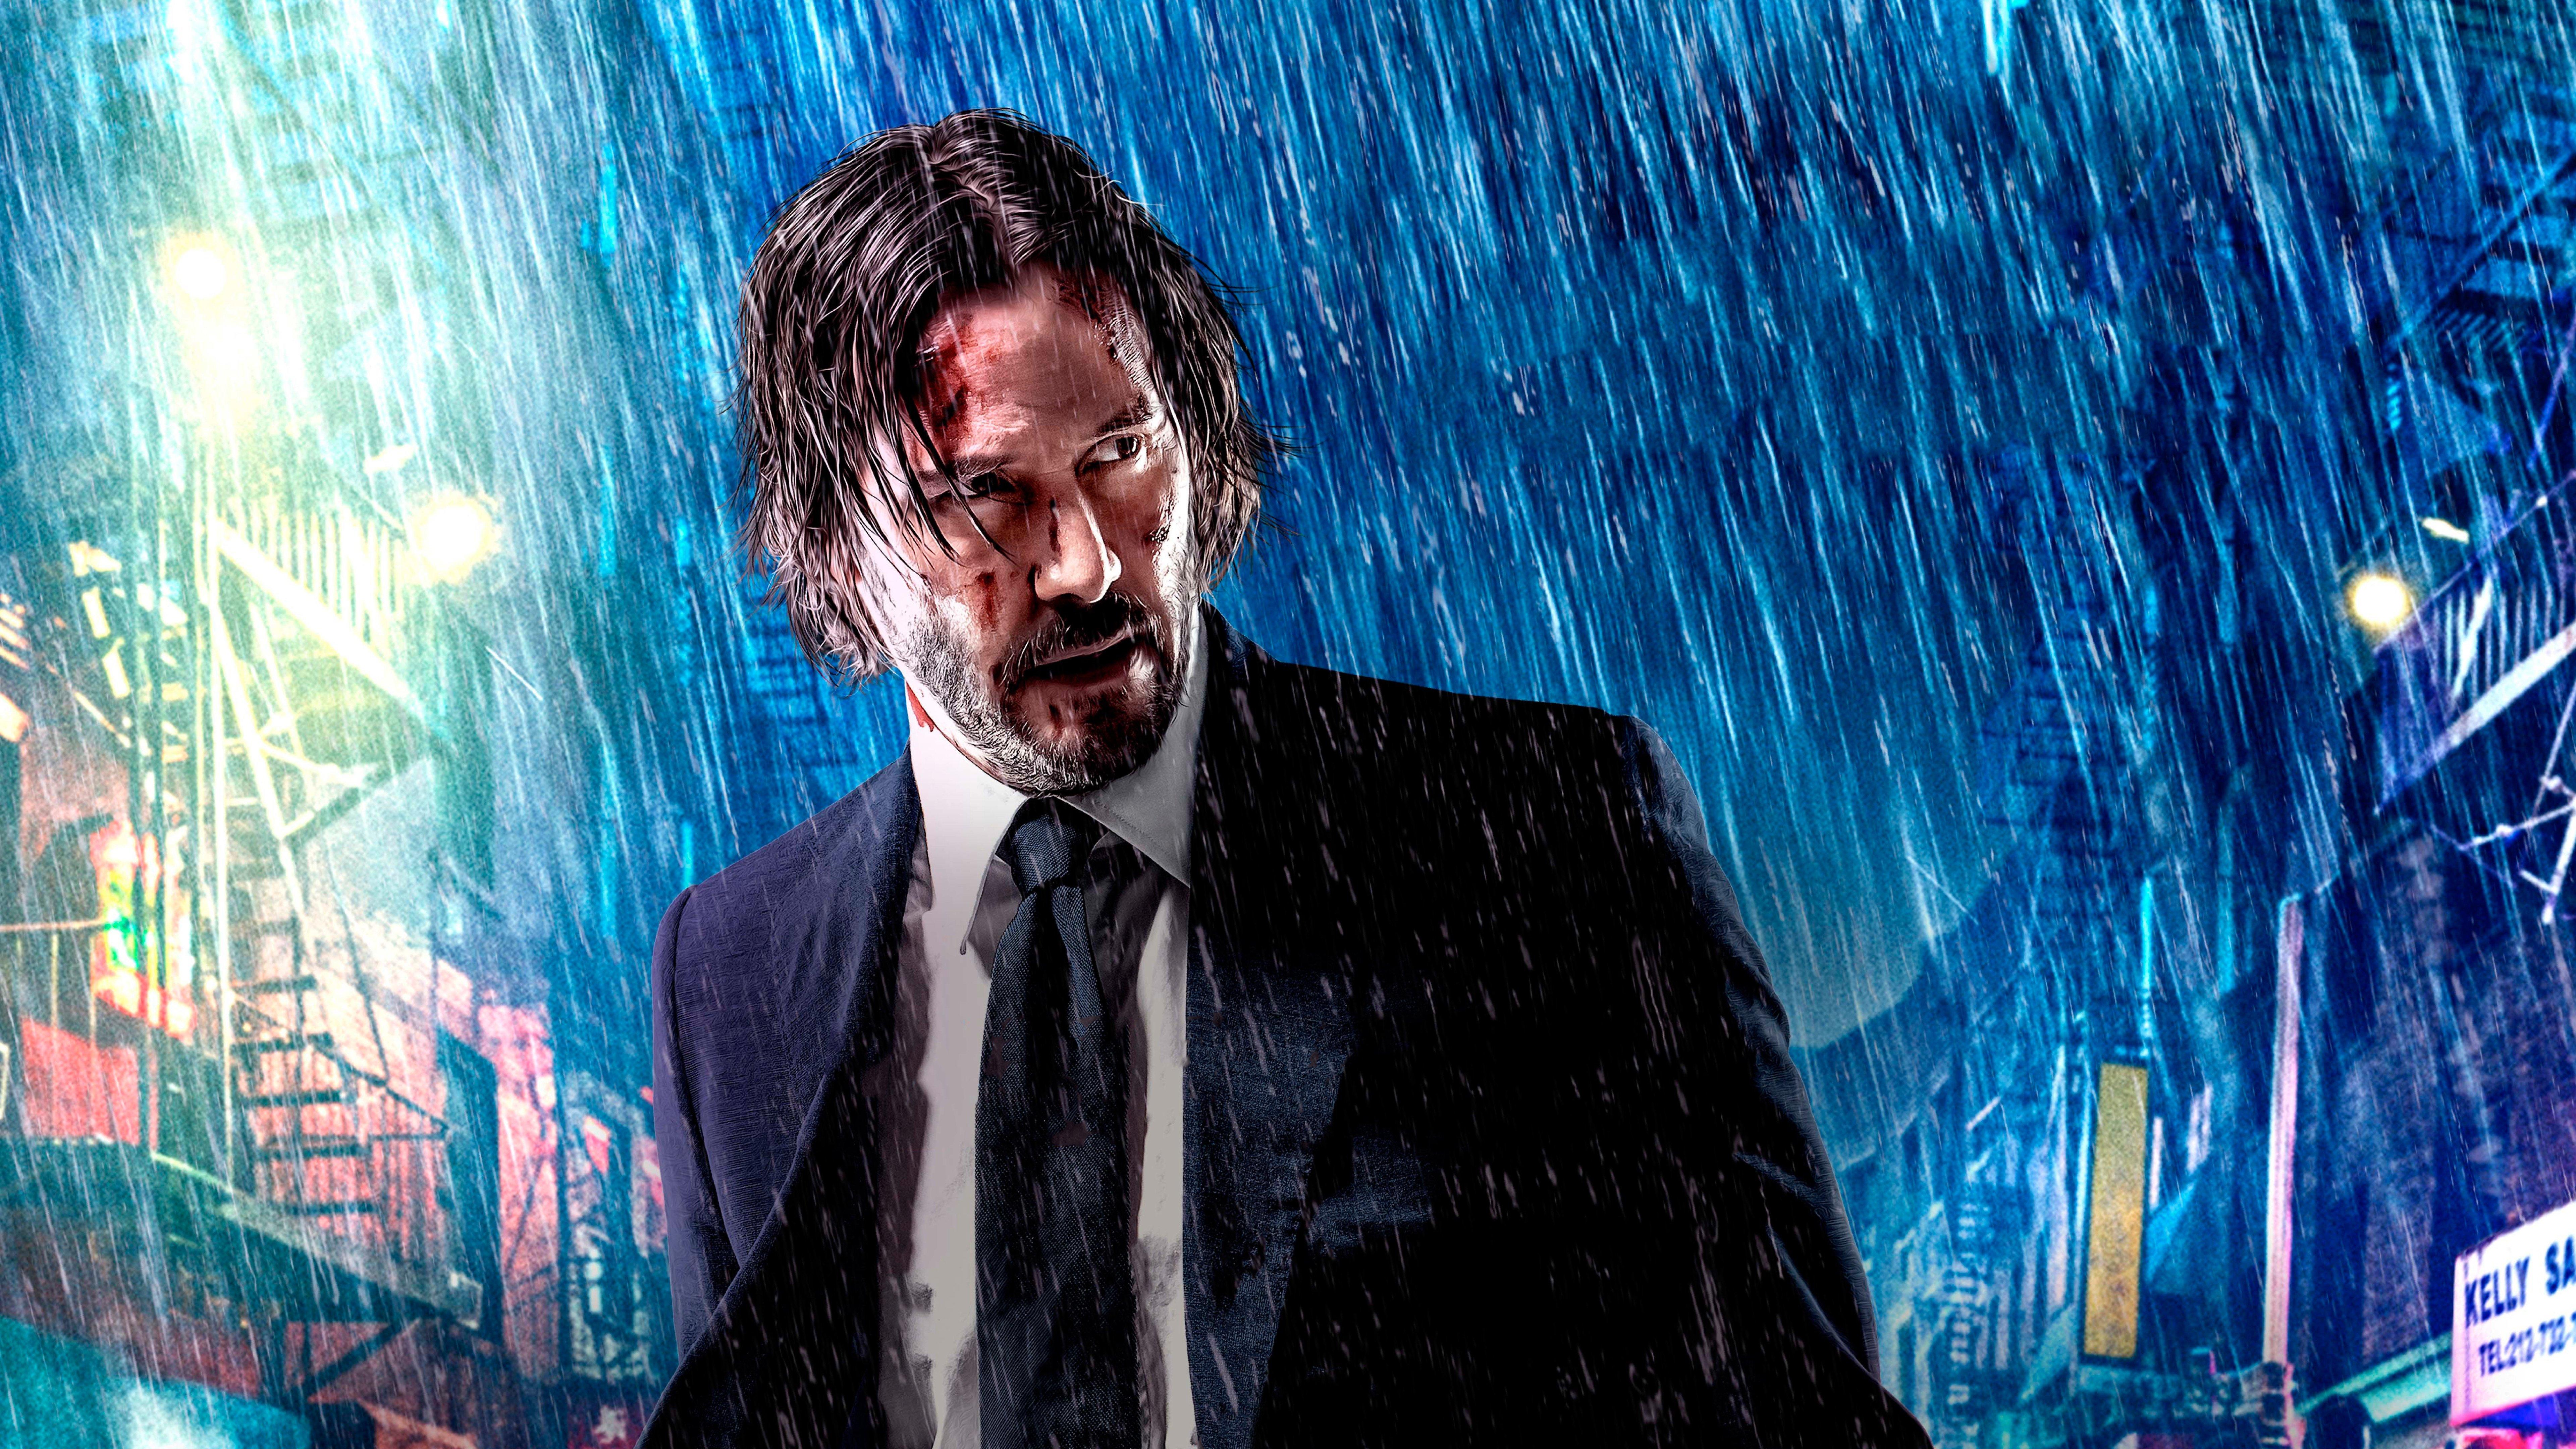 Wallpaper John Wick 3 Parebellum Keanu Reeves